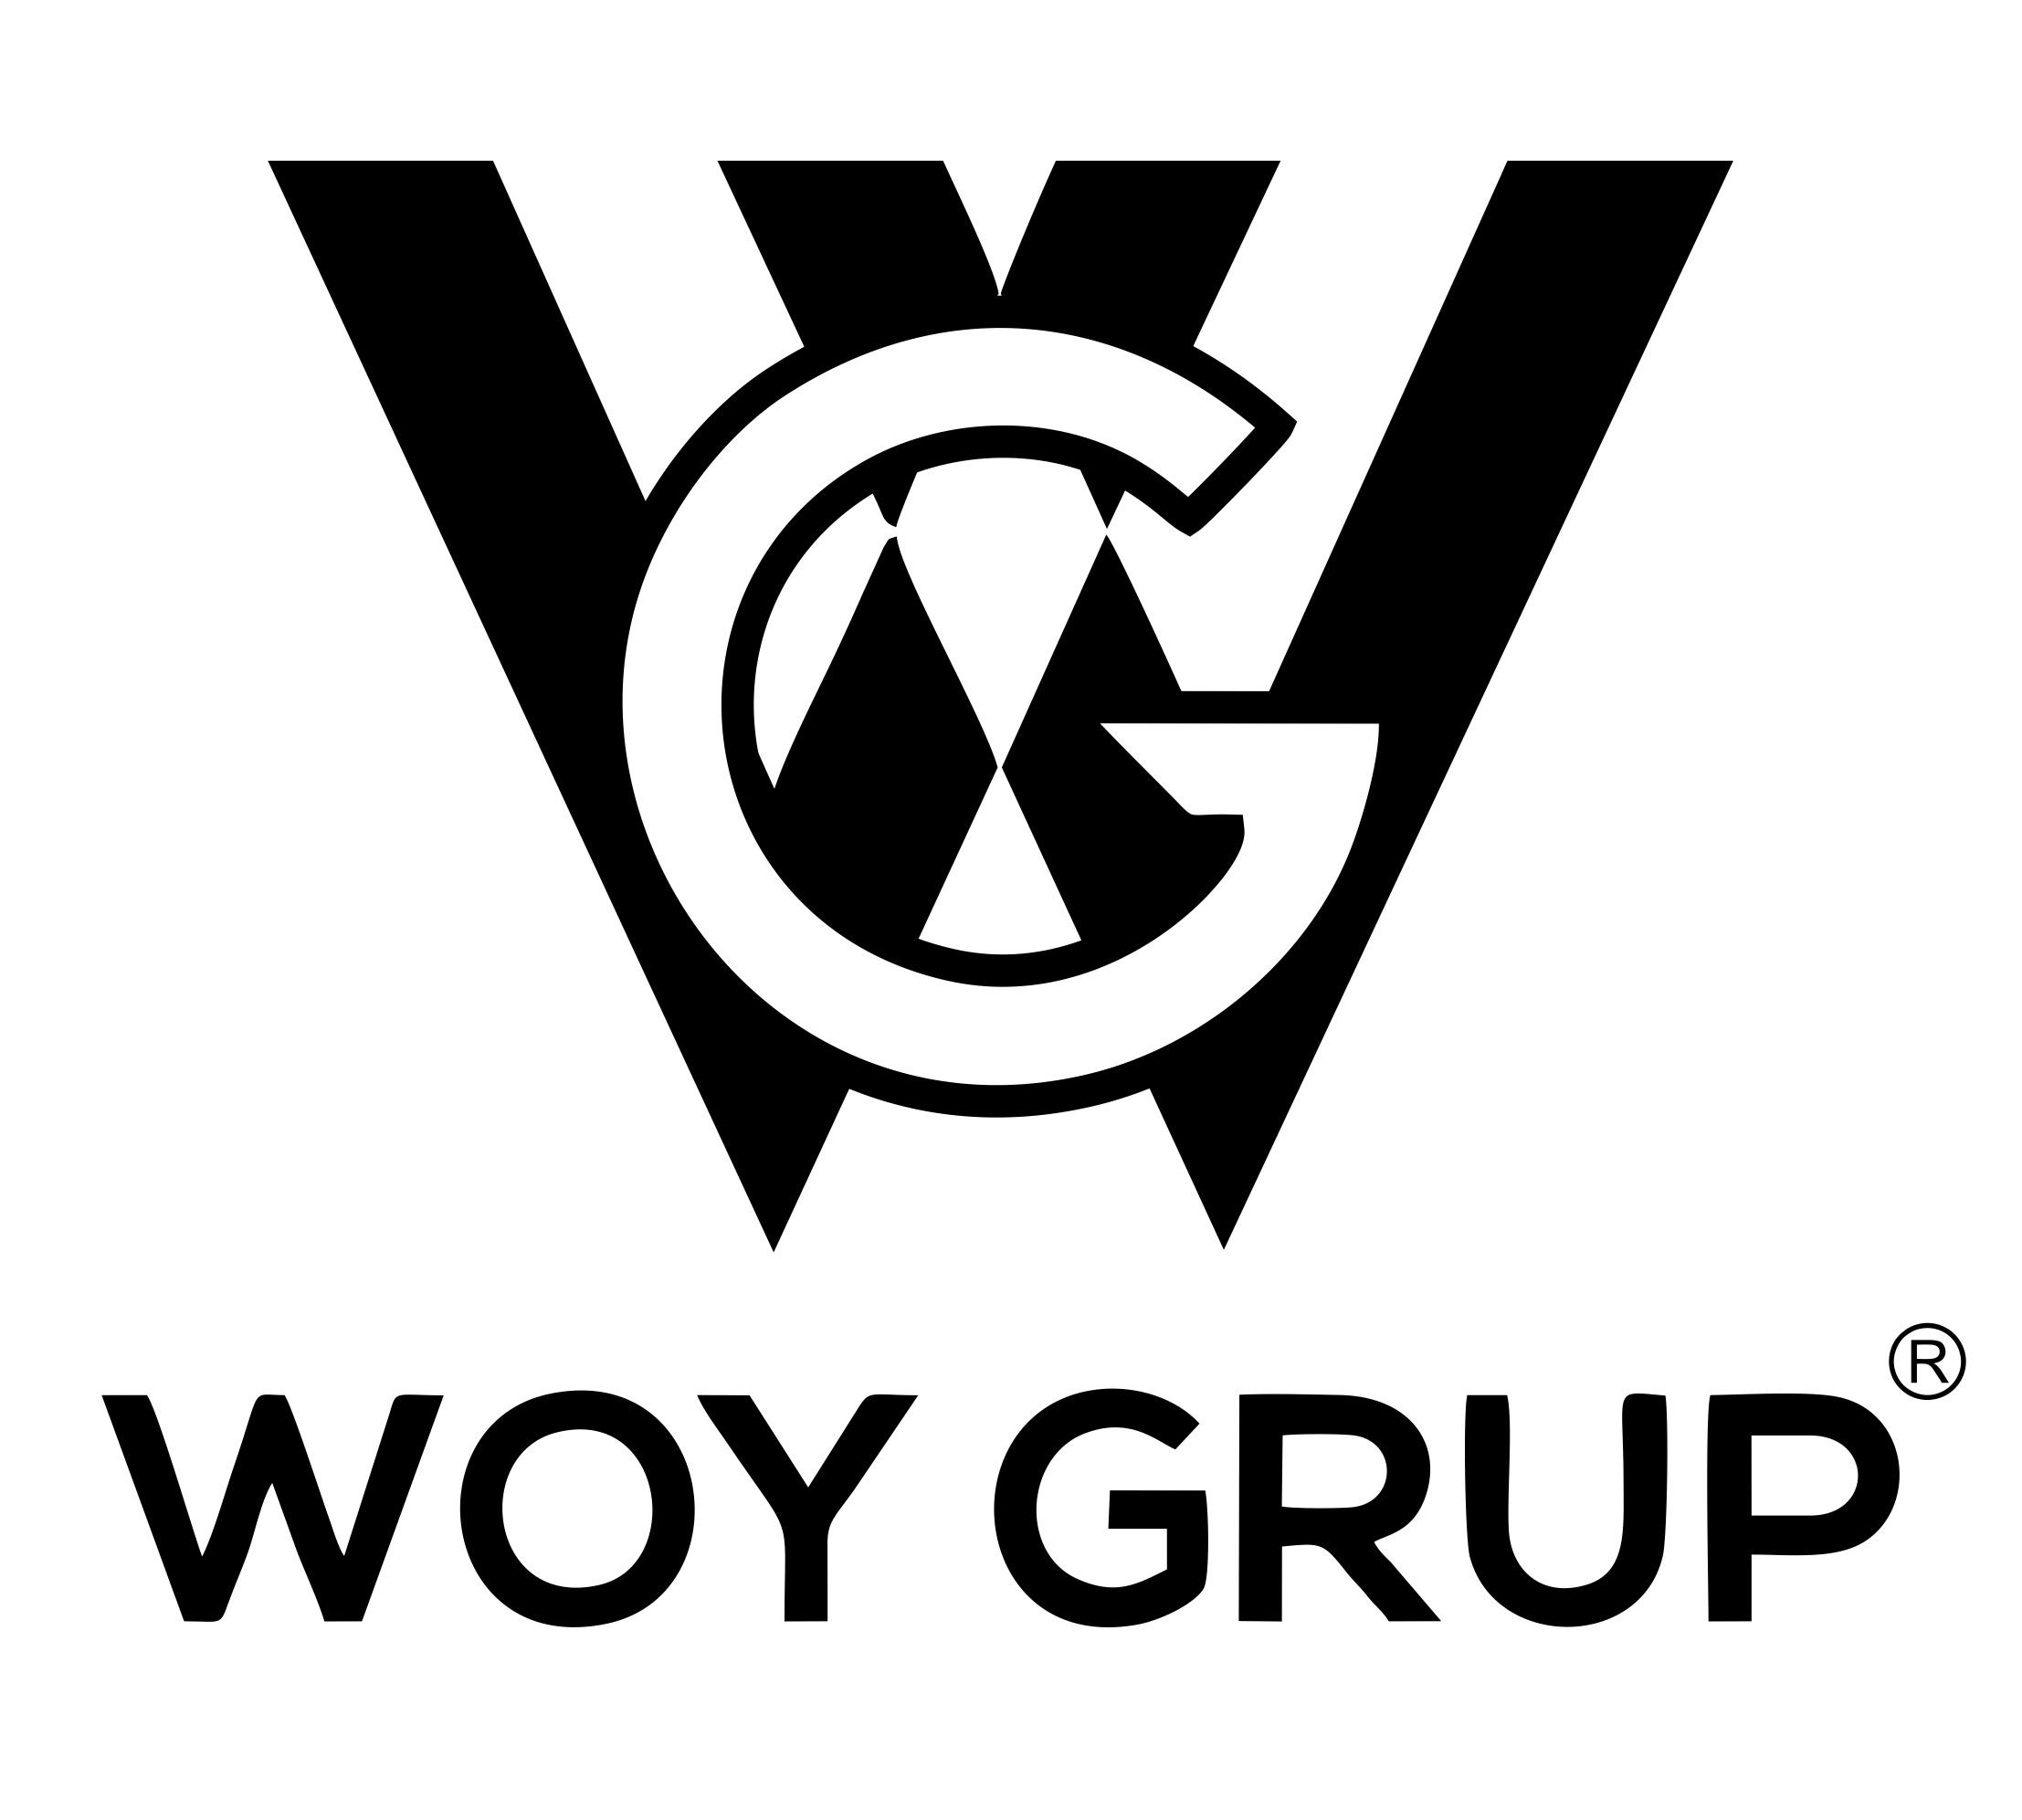 WOY GRUP